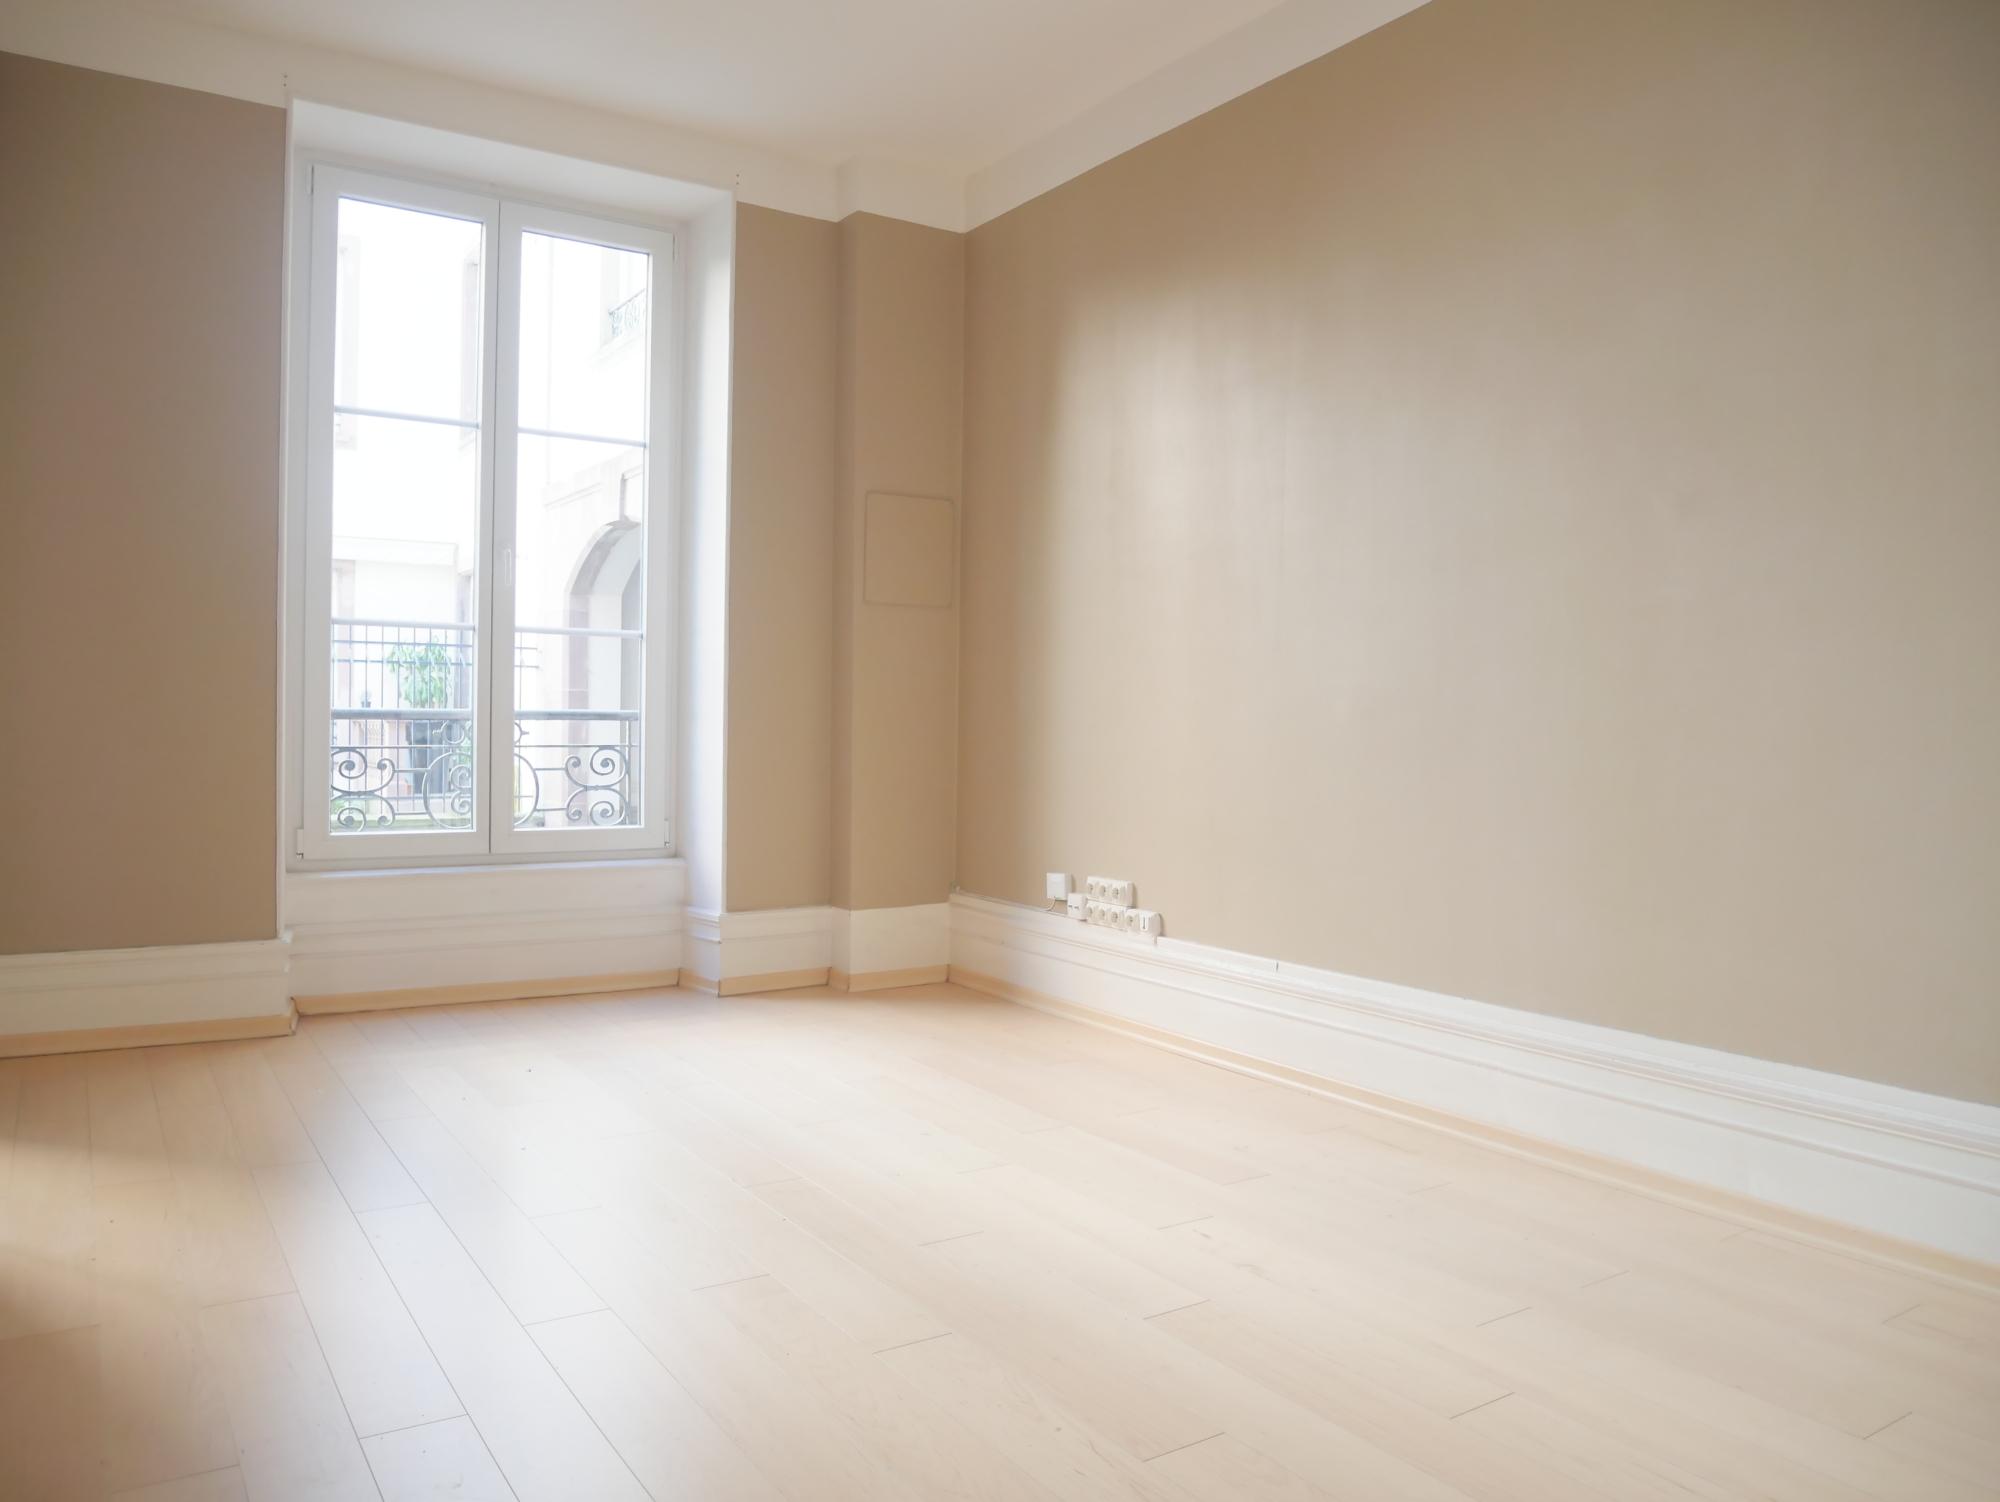 [Triomphe] Local professionnel - C.C les Halles / Quai Kléber - nos locations - Beausite Immobilier 3